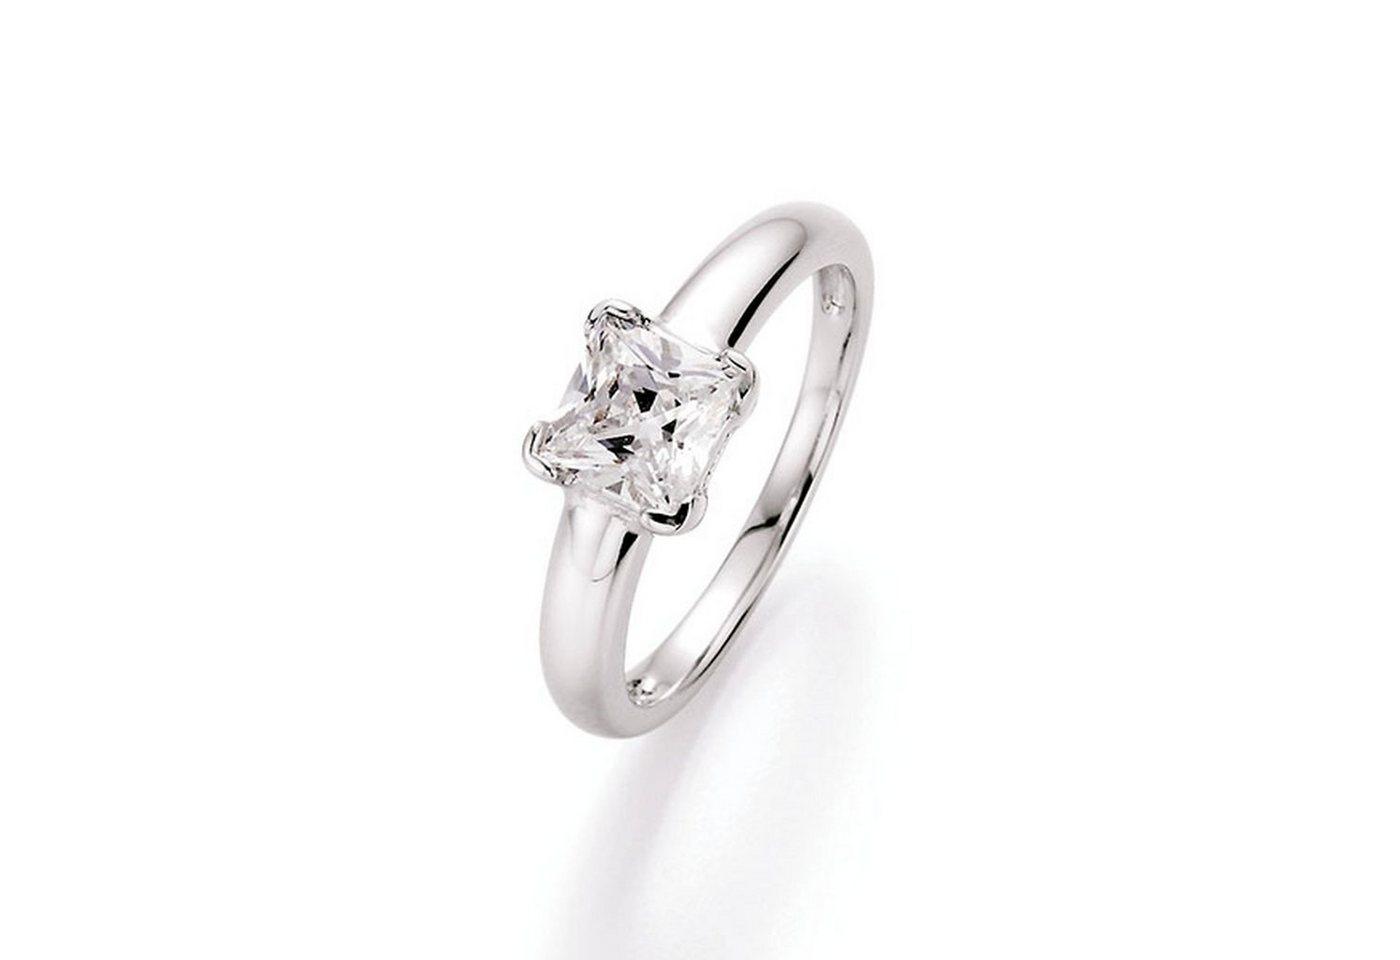 Smart Jewel Verlobungsring »Zirkonia carréförmig« | Schmuck > Ringe > Verlobungsringe | Weiß | Smart Jewel